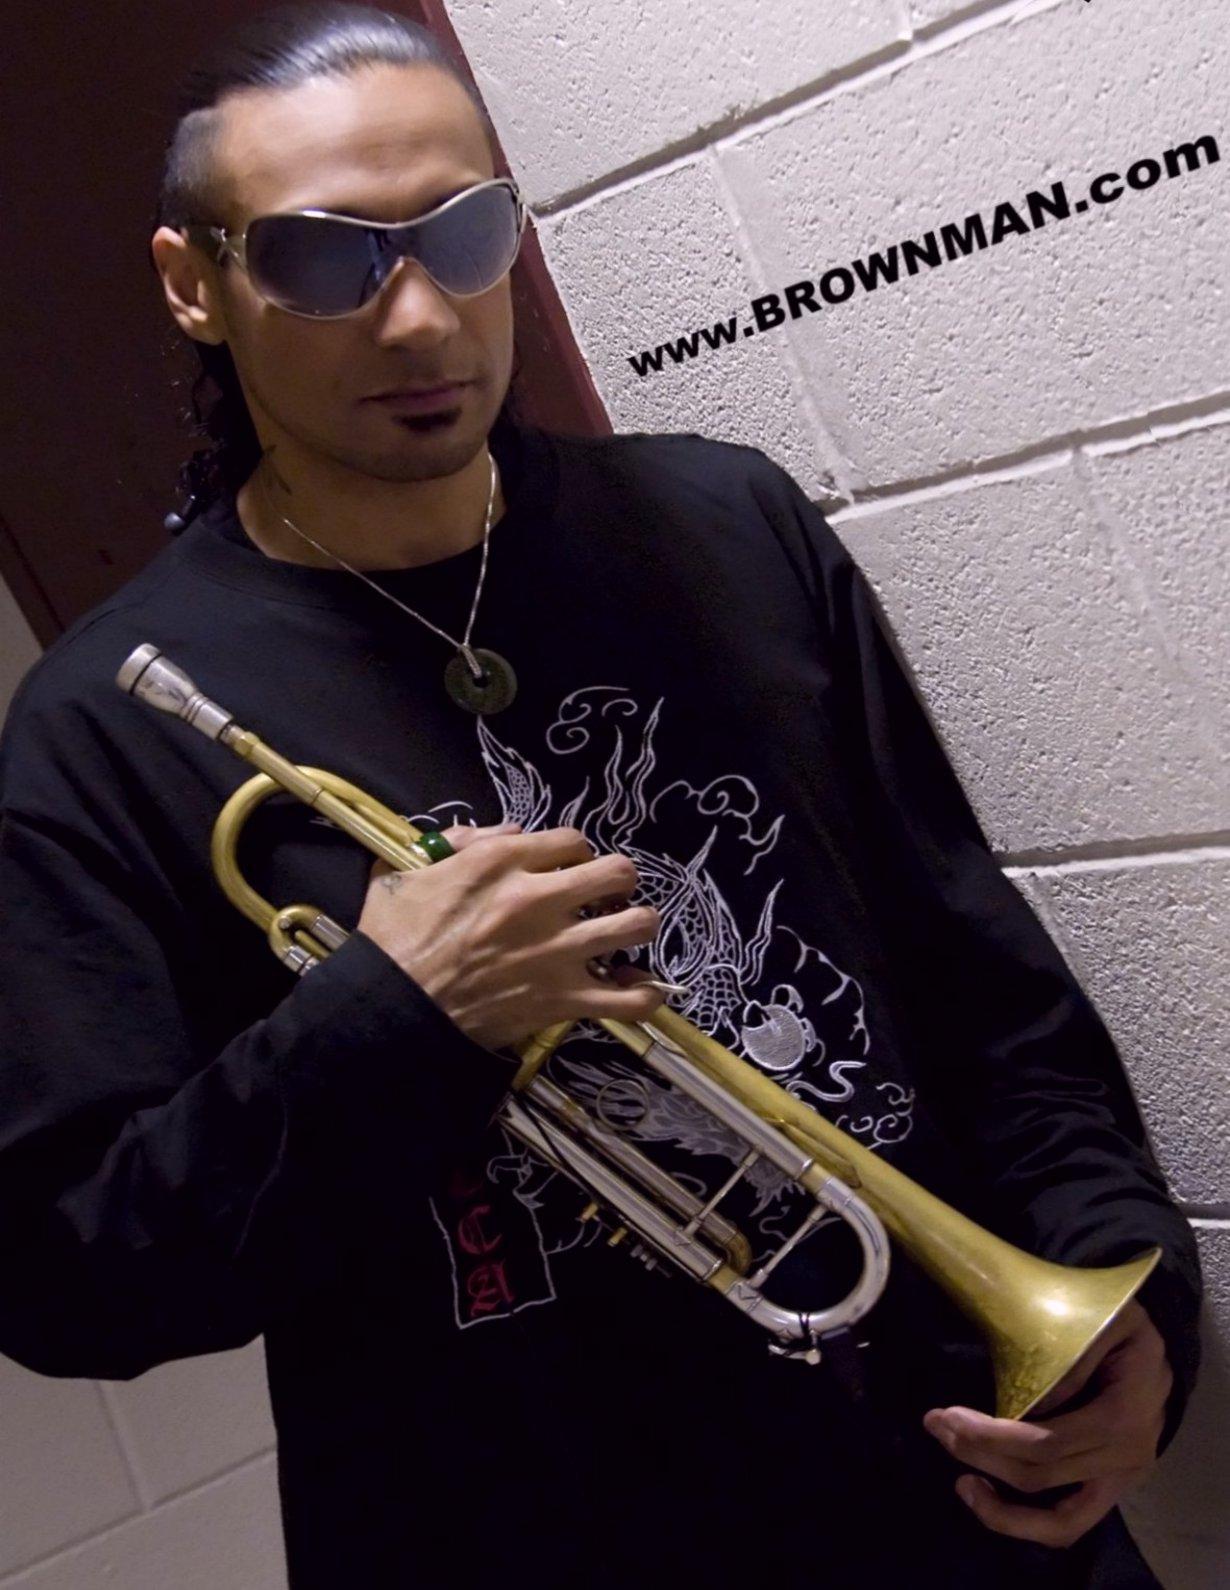 Brownman on tour - Detroit